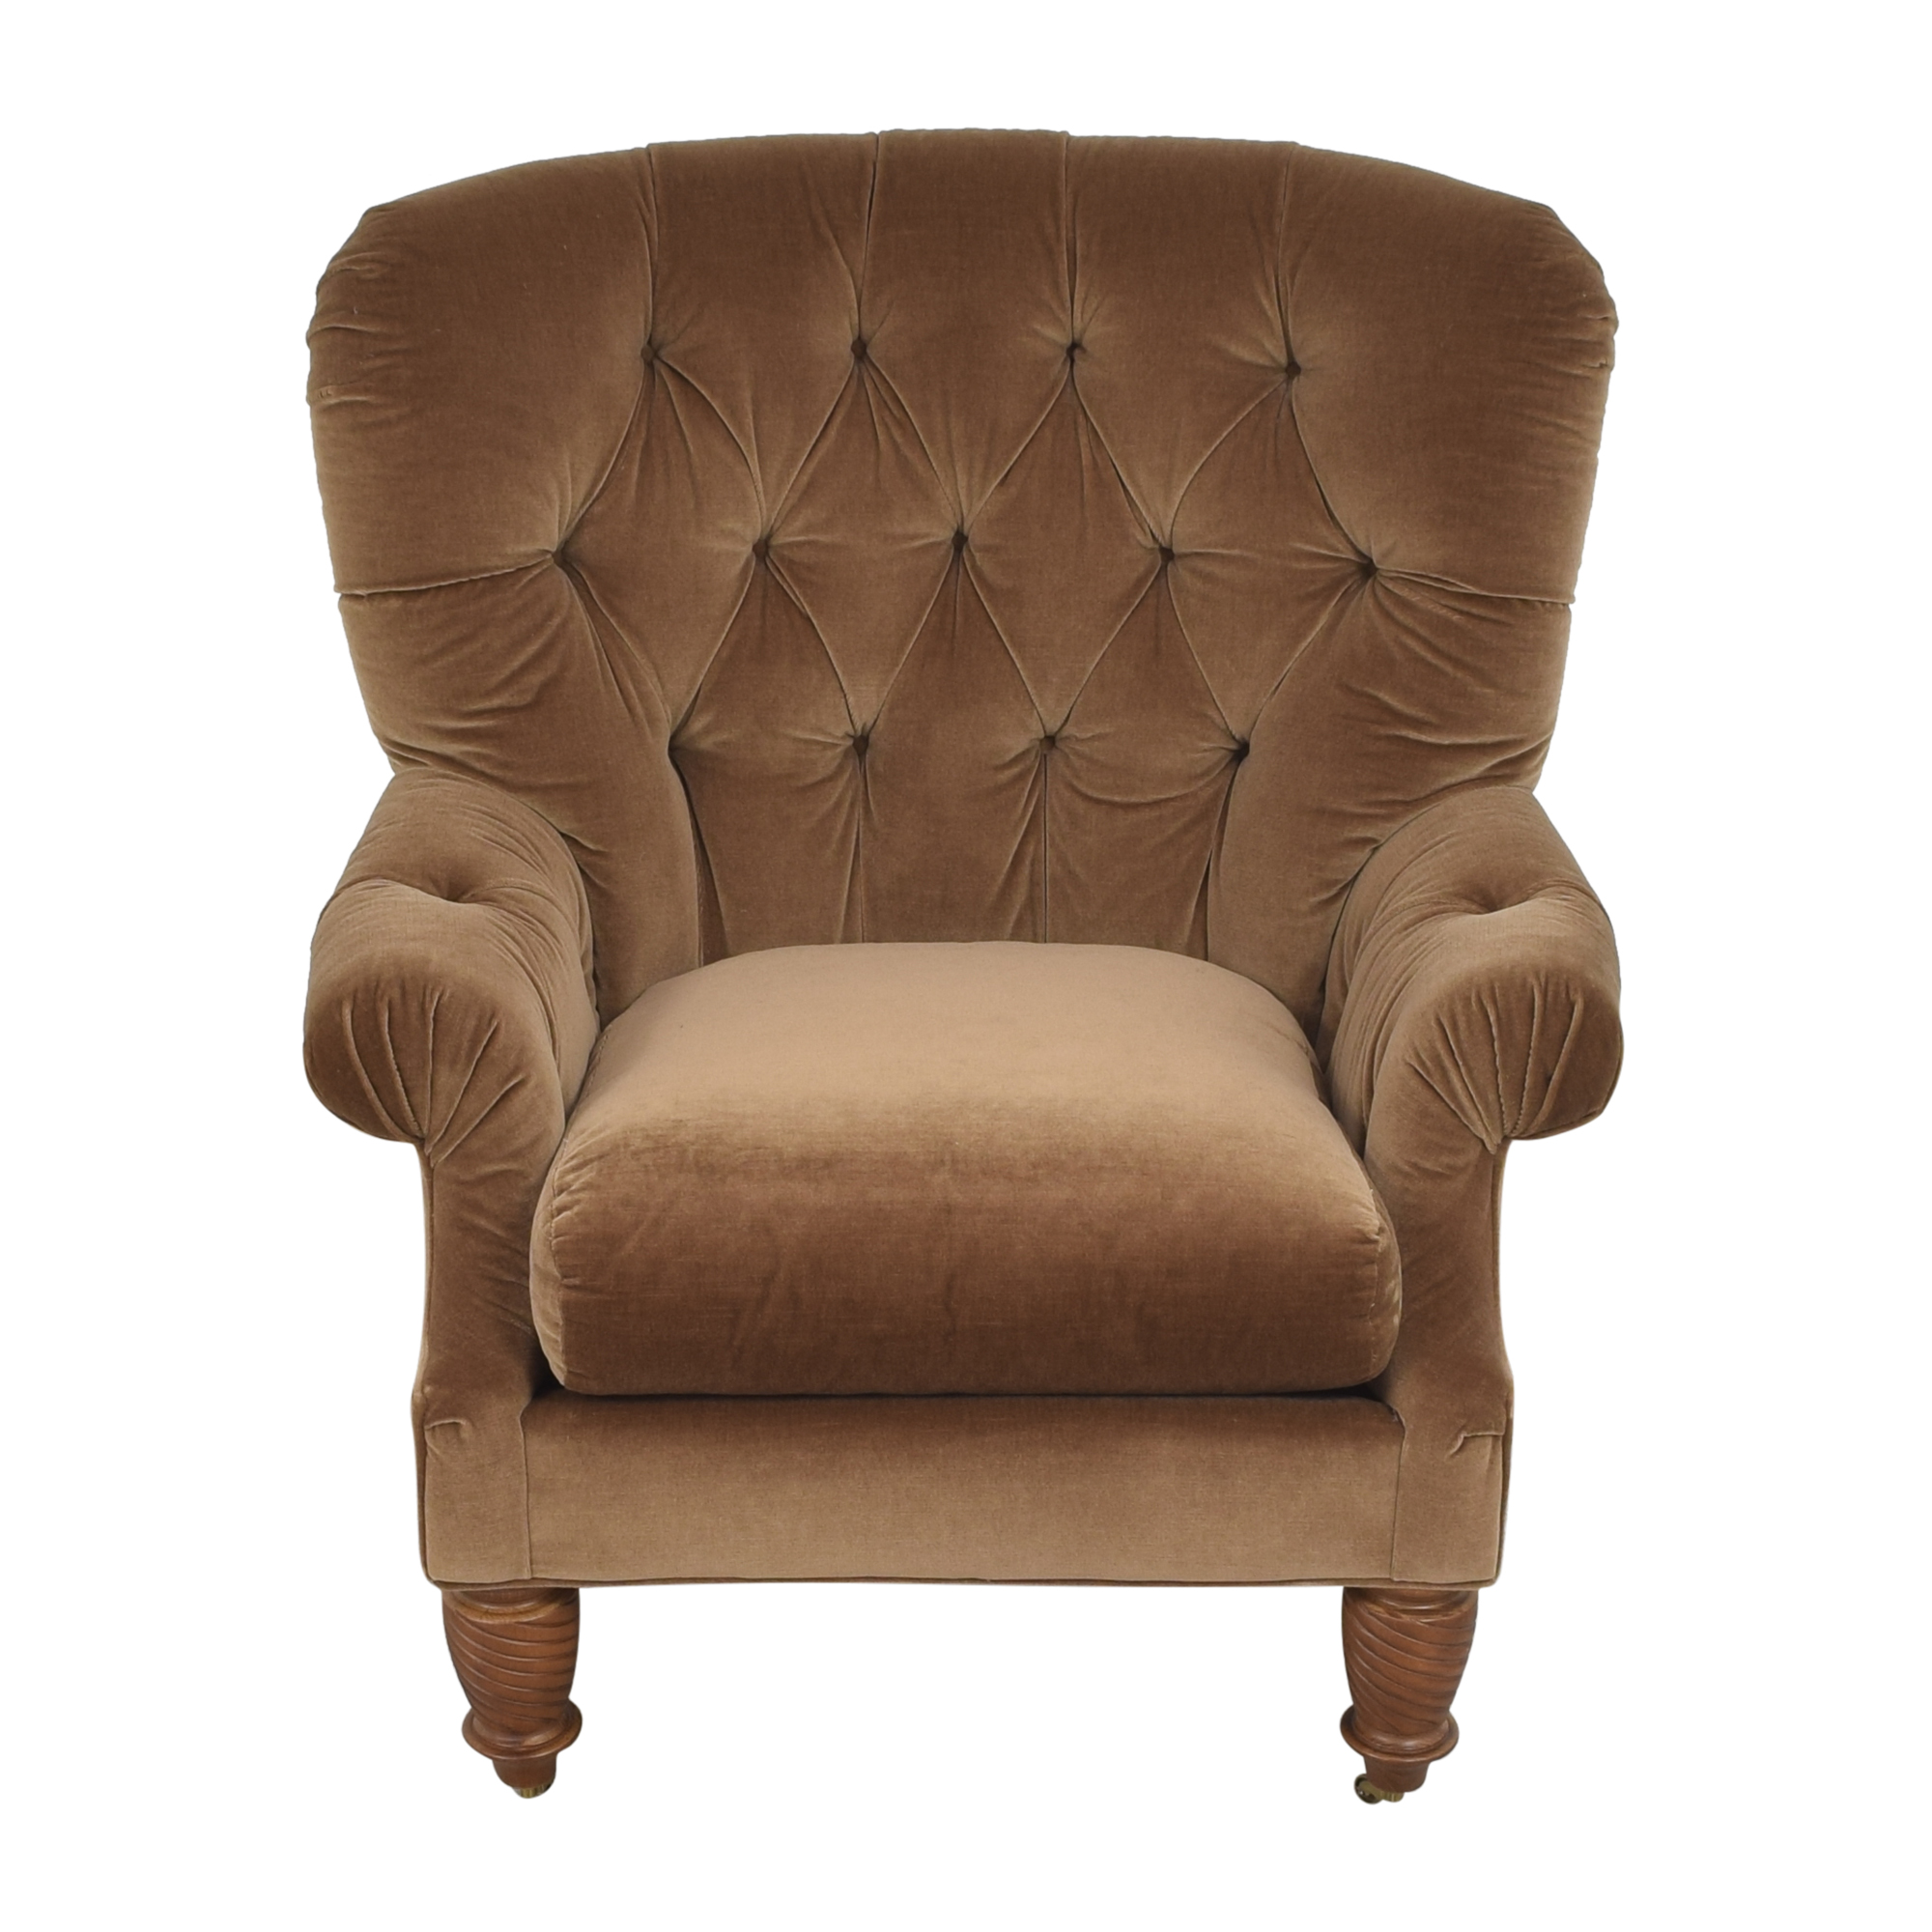 Kravet Tufted Accent Chair sale